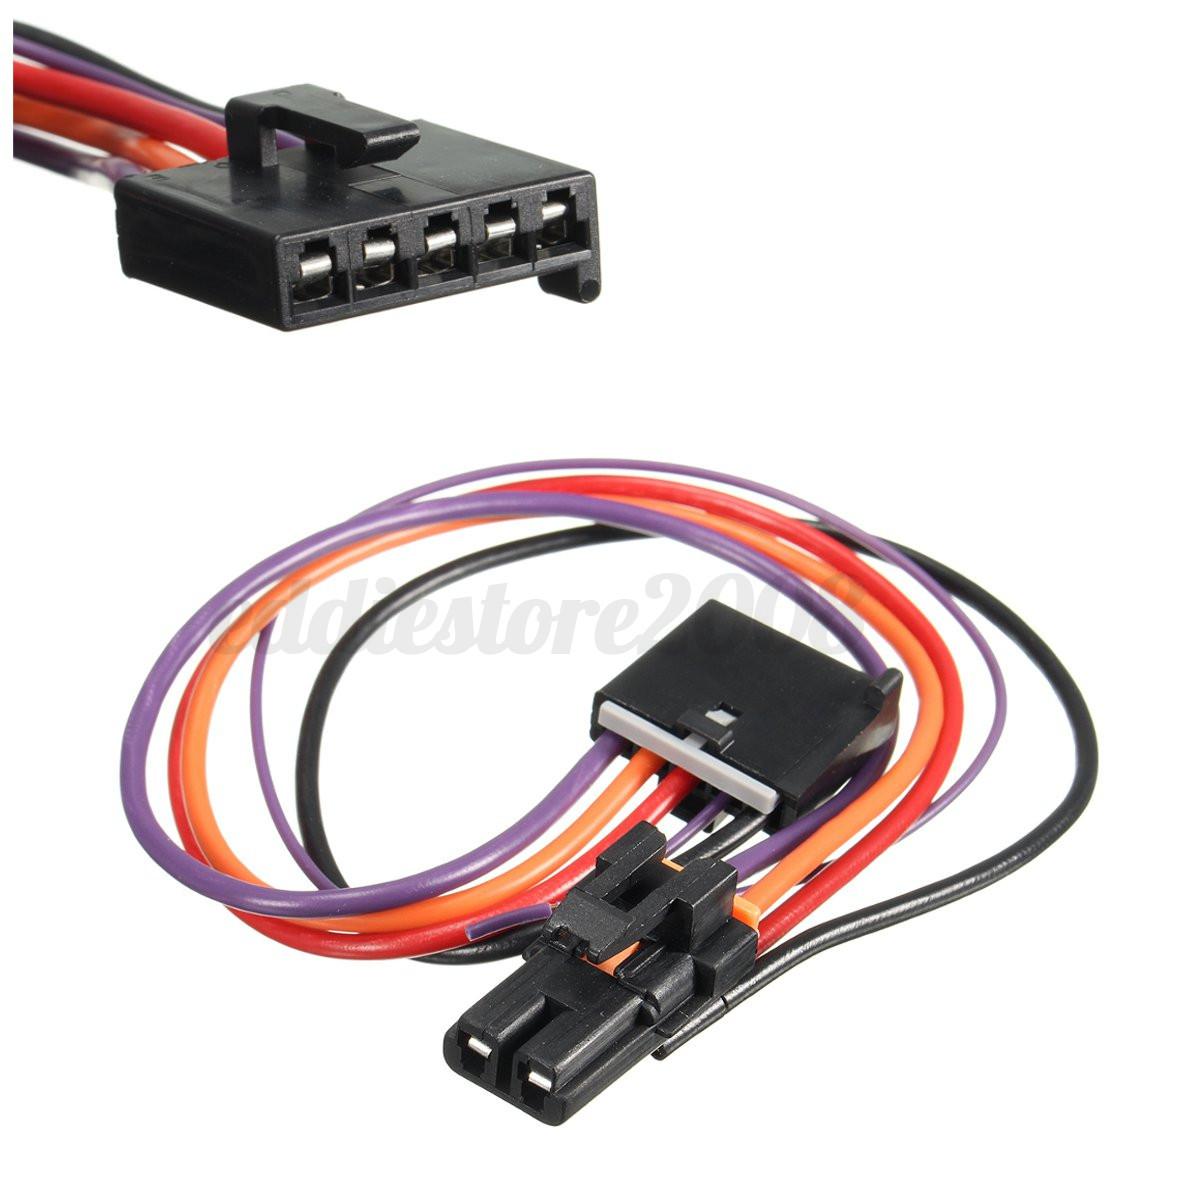 2003 Gmc Sierra Wiring Harness Schematic 2019 19260762 Ac Heater Blower Control Module For Yukon 1500